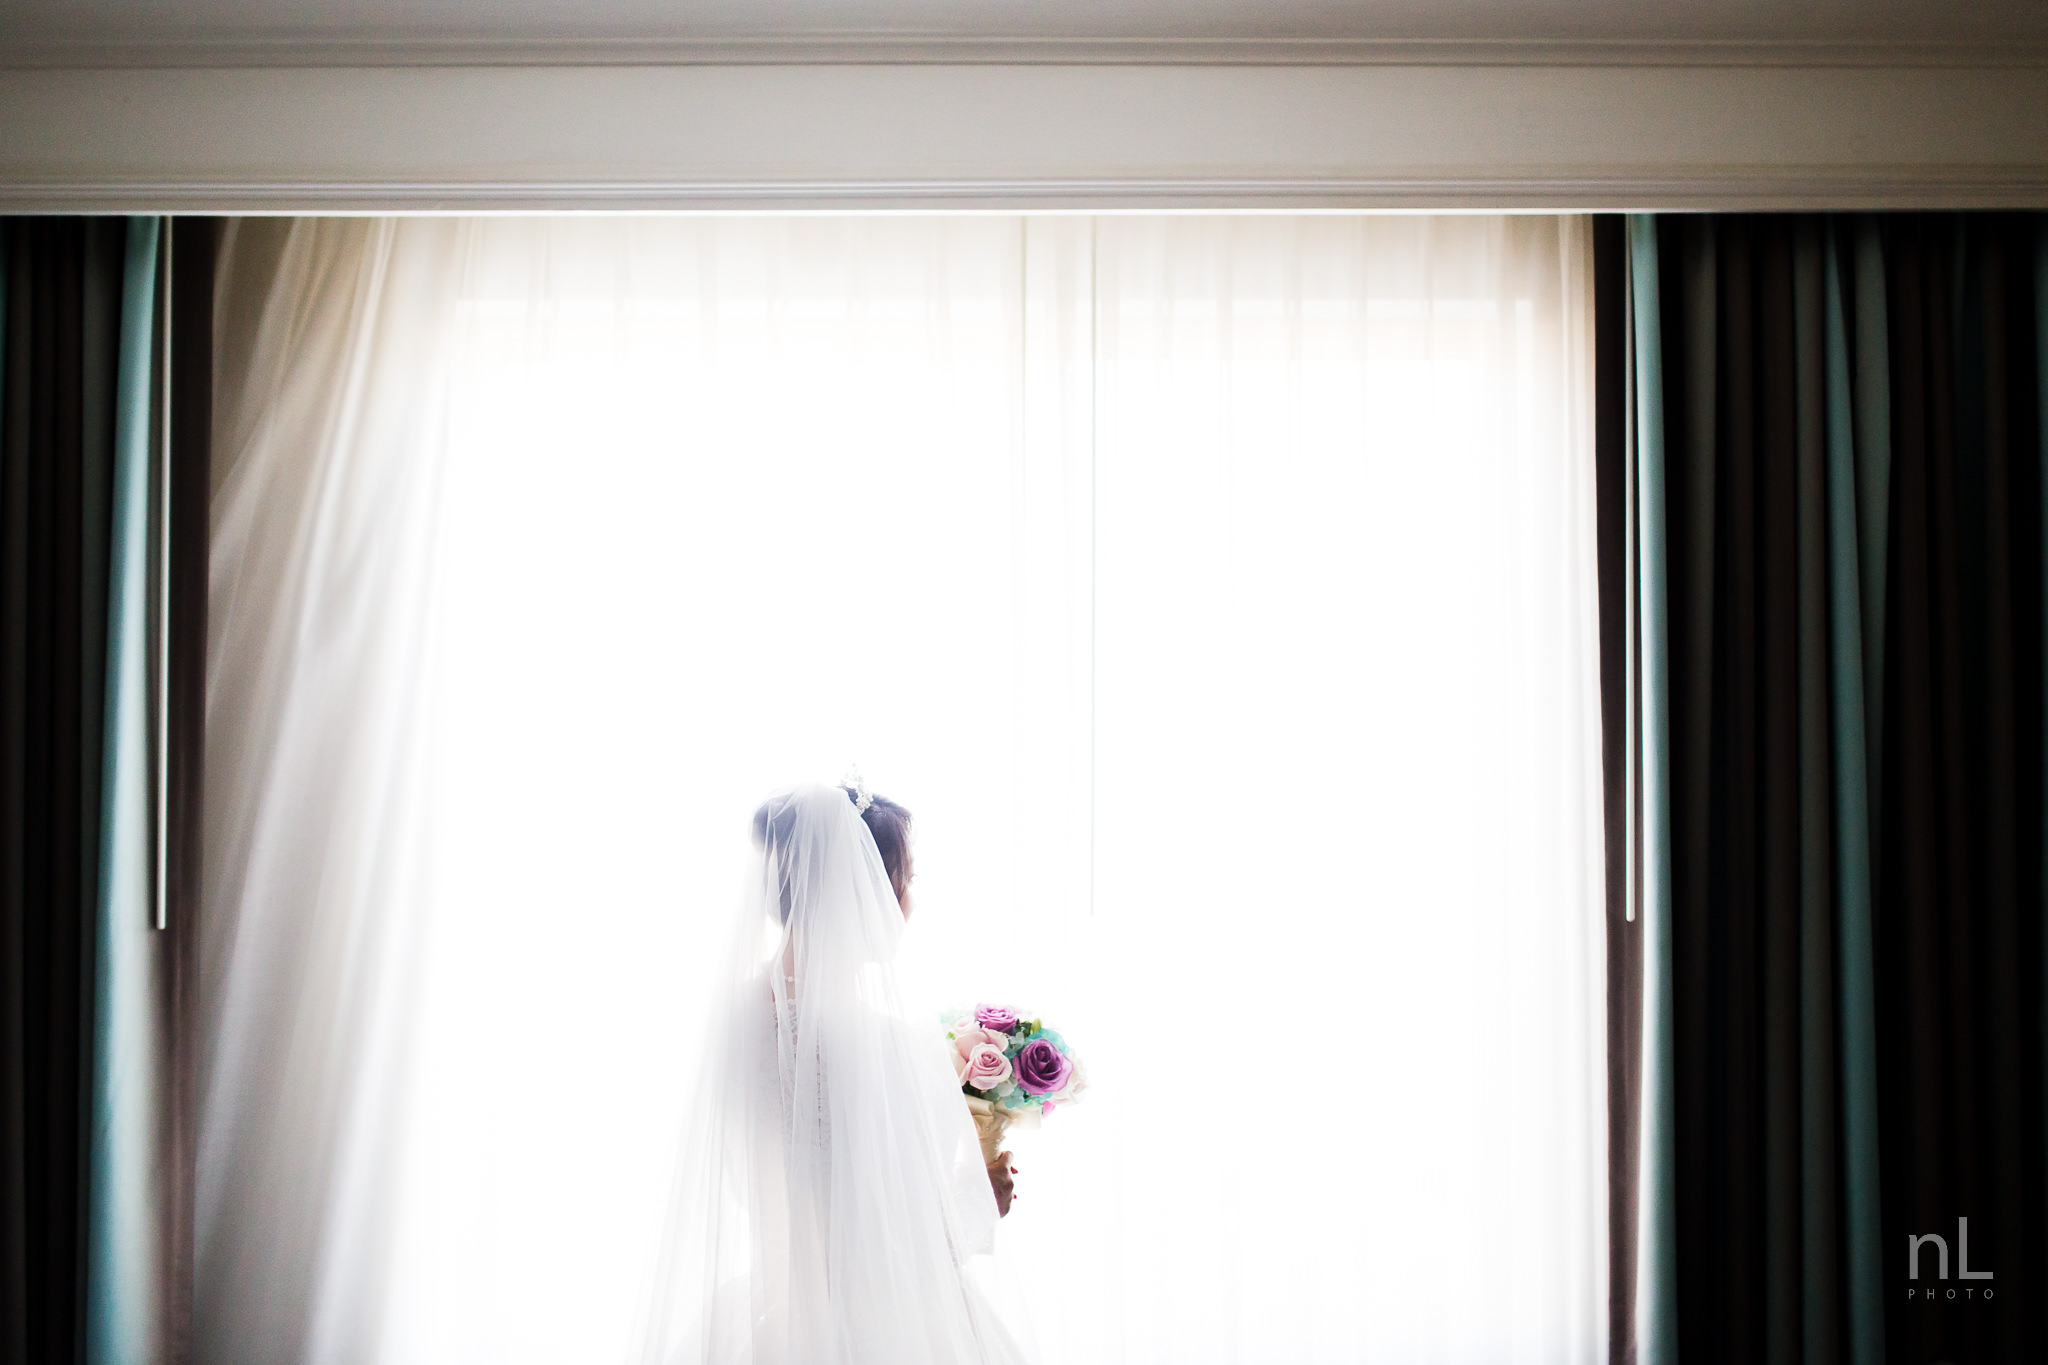 nick-lie-photography-los-angeles-wedding-photographer-12.jpg